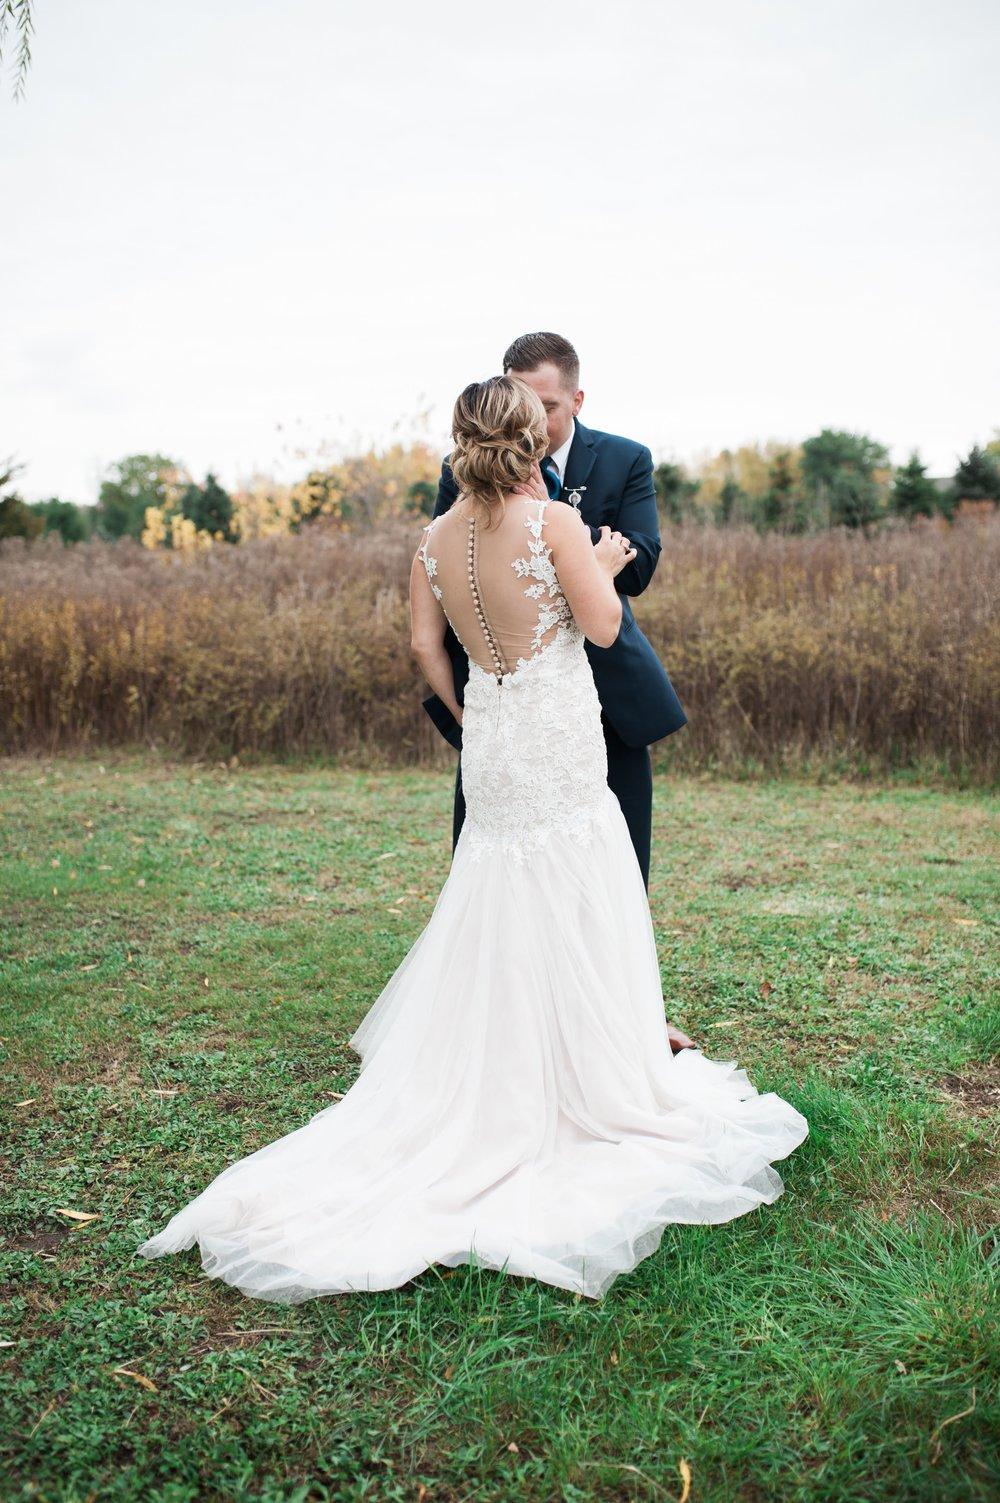 LLP Michigan Wedding Photographer 20.jpg